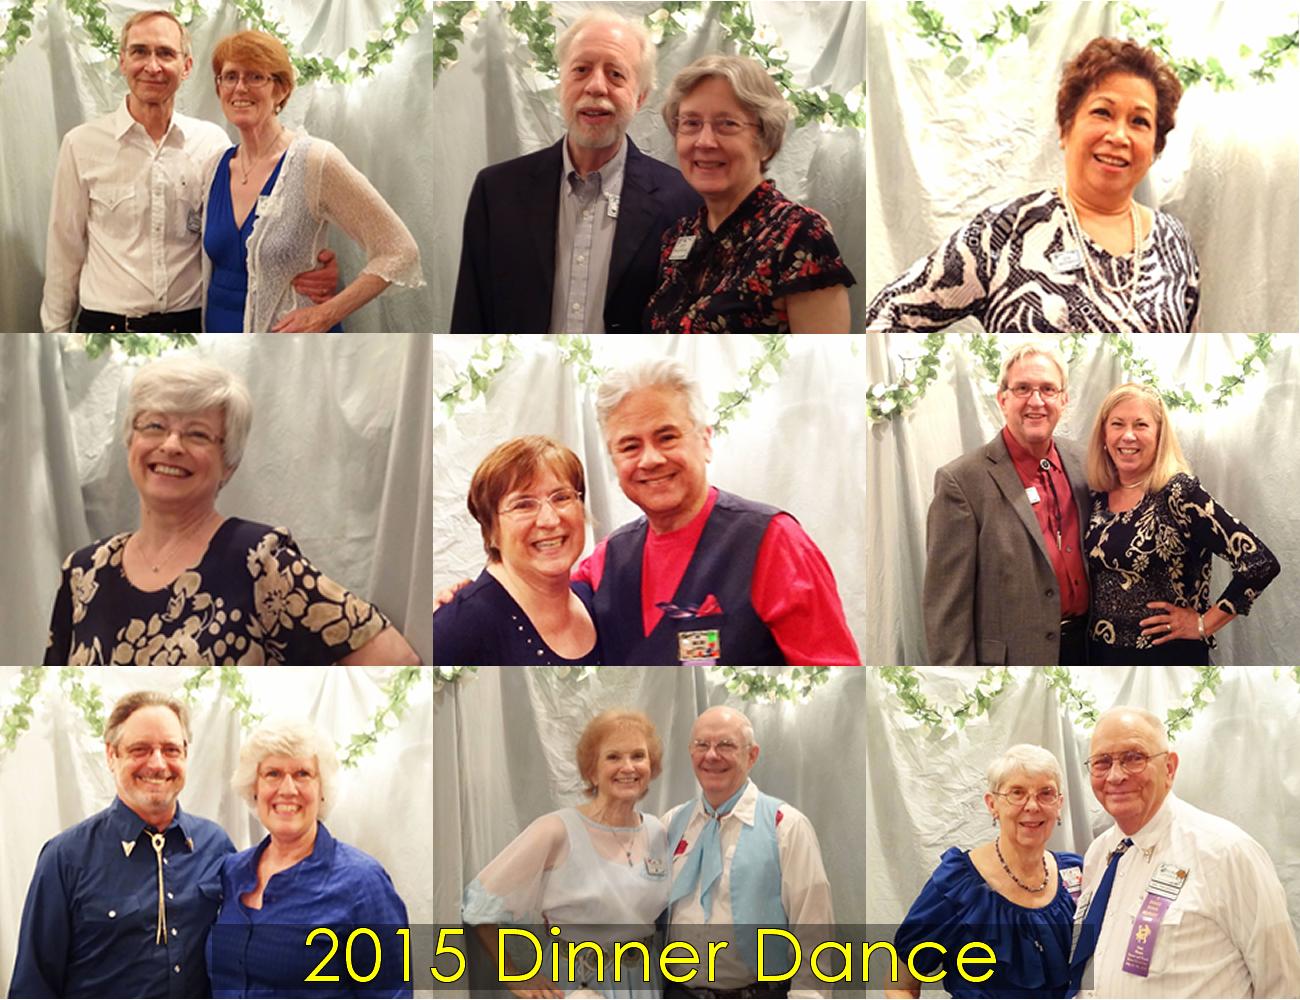 Dinner Dance Montage.png